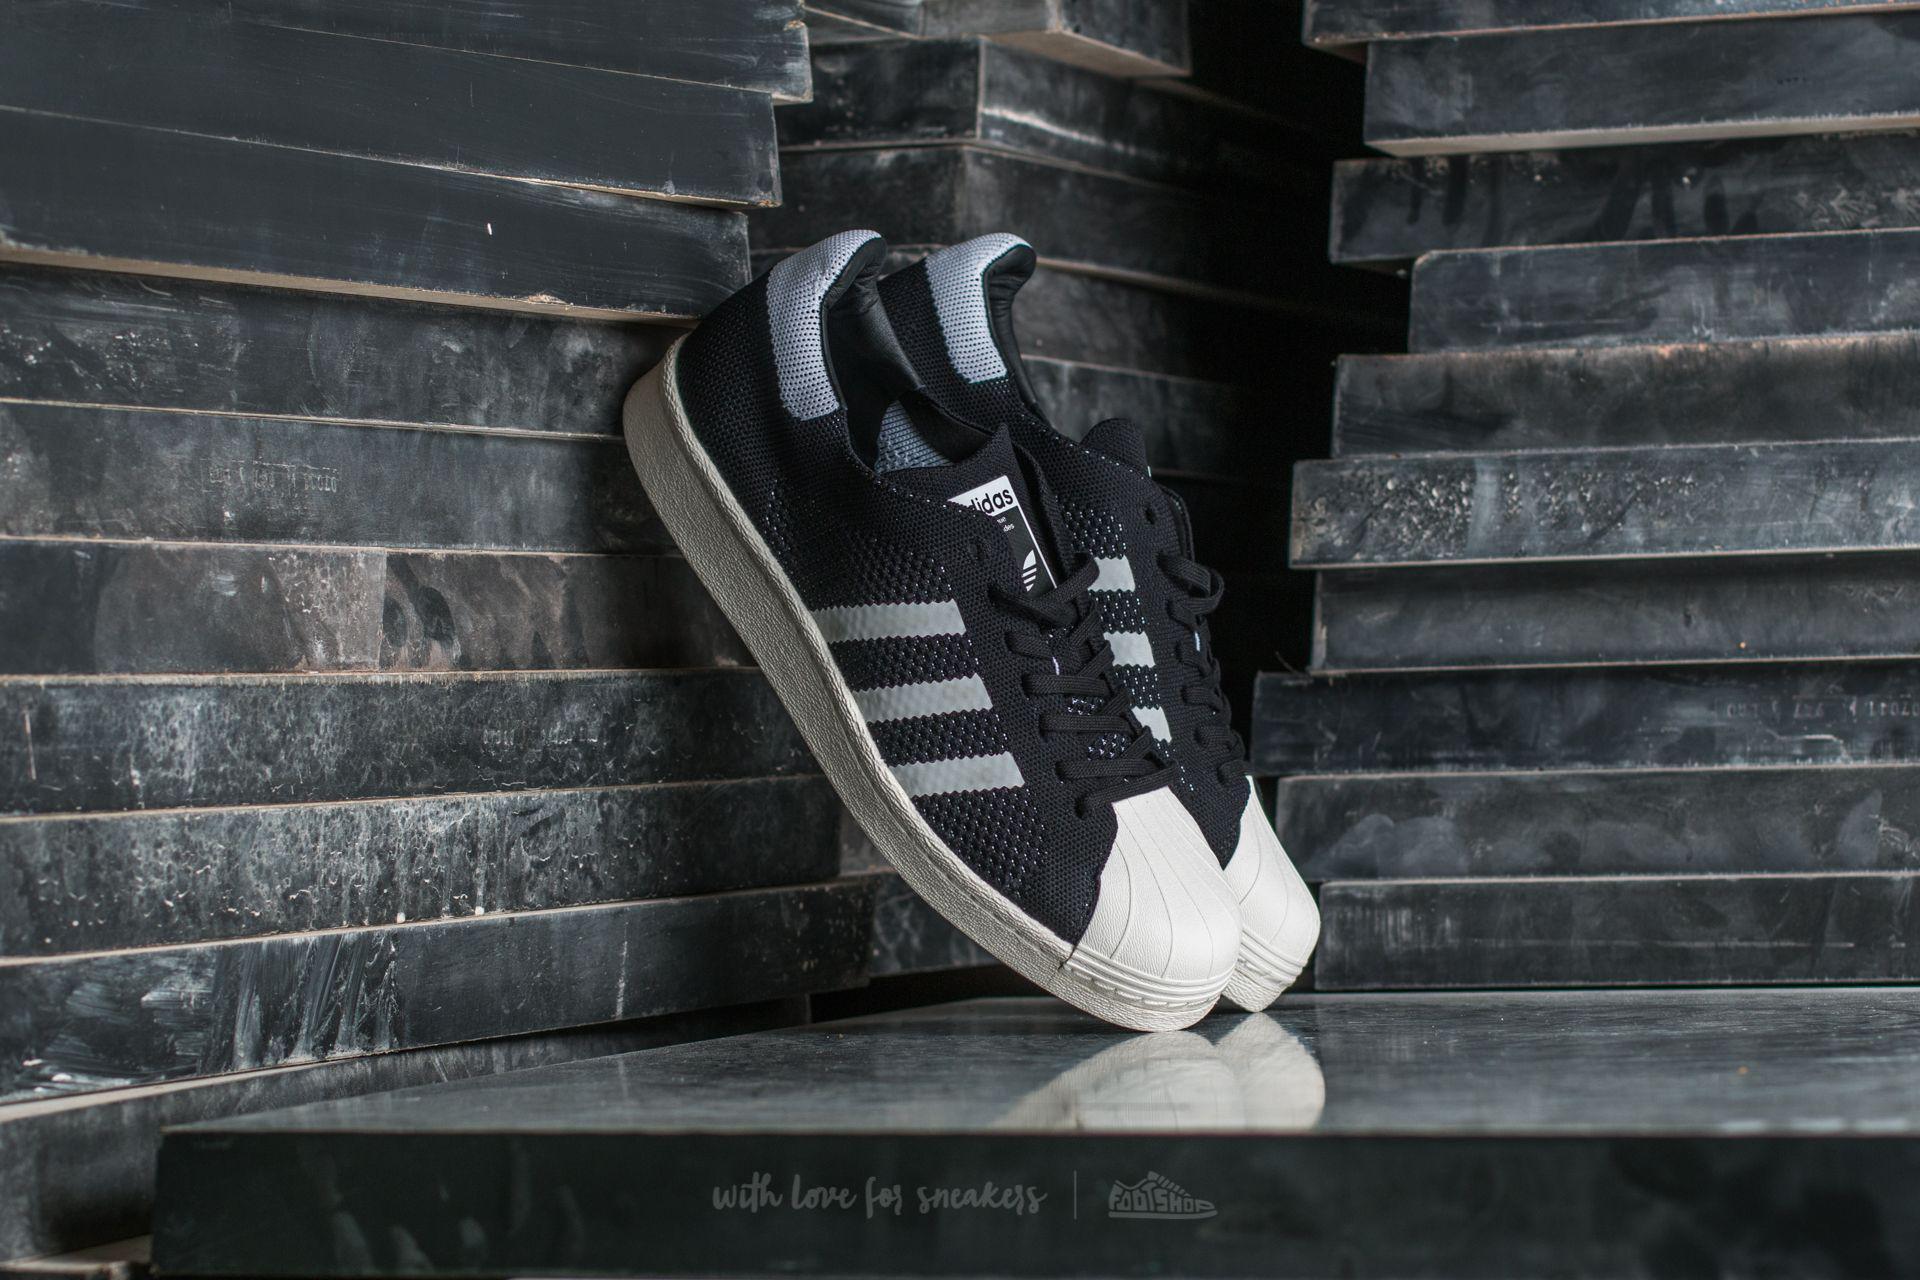 outlet store 05841 89883 adidas-originals--Adidas-Superstar -Primeknit-Ftw-White-Core-Black-Off-White.jpeg